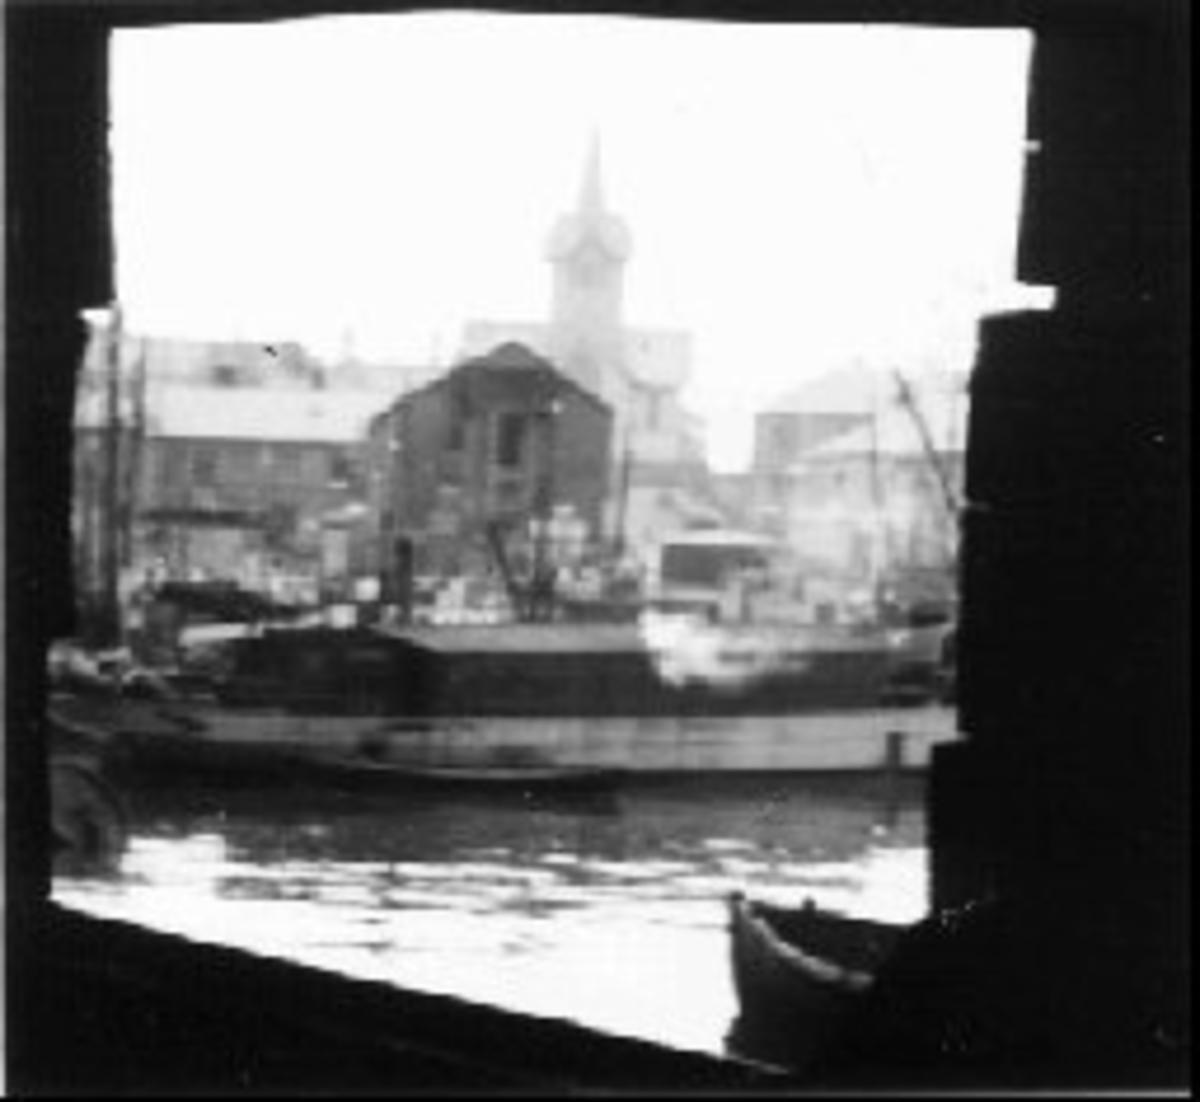 Båt, bebyggelse